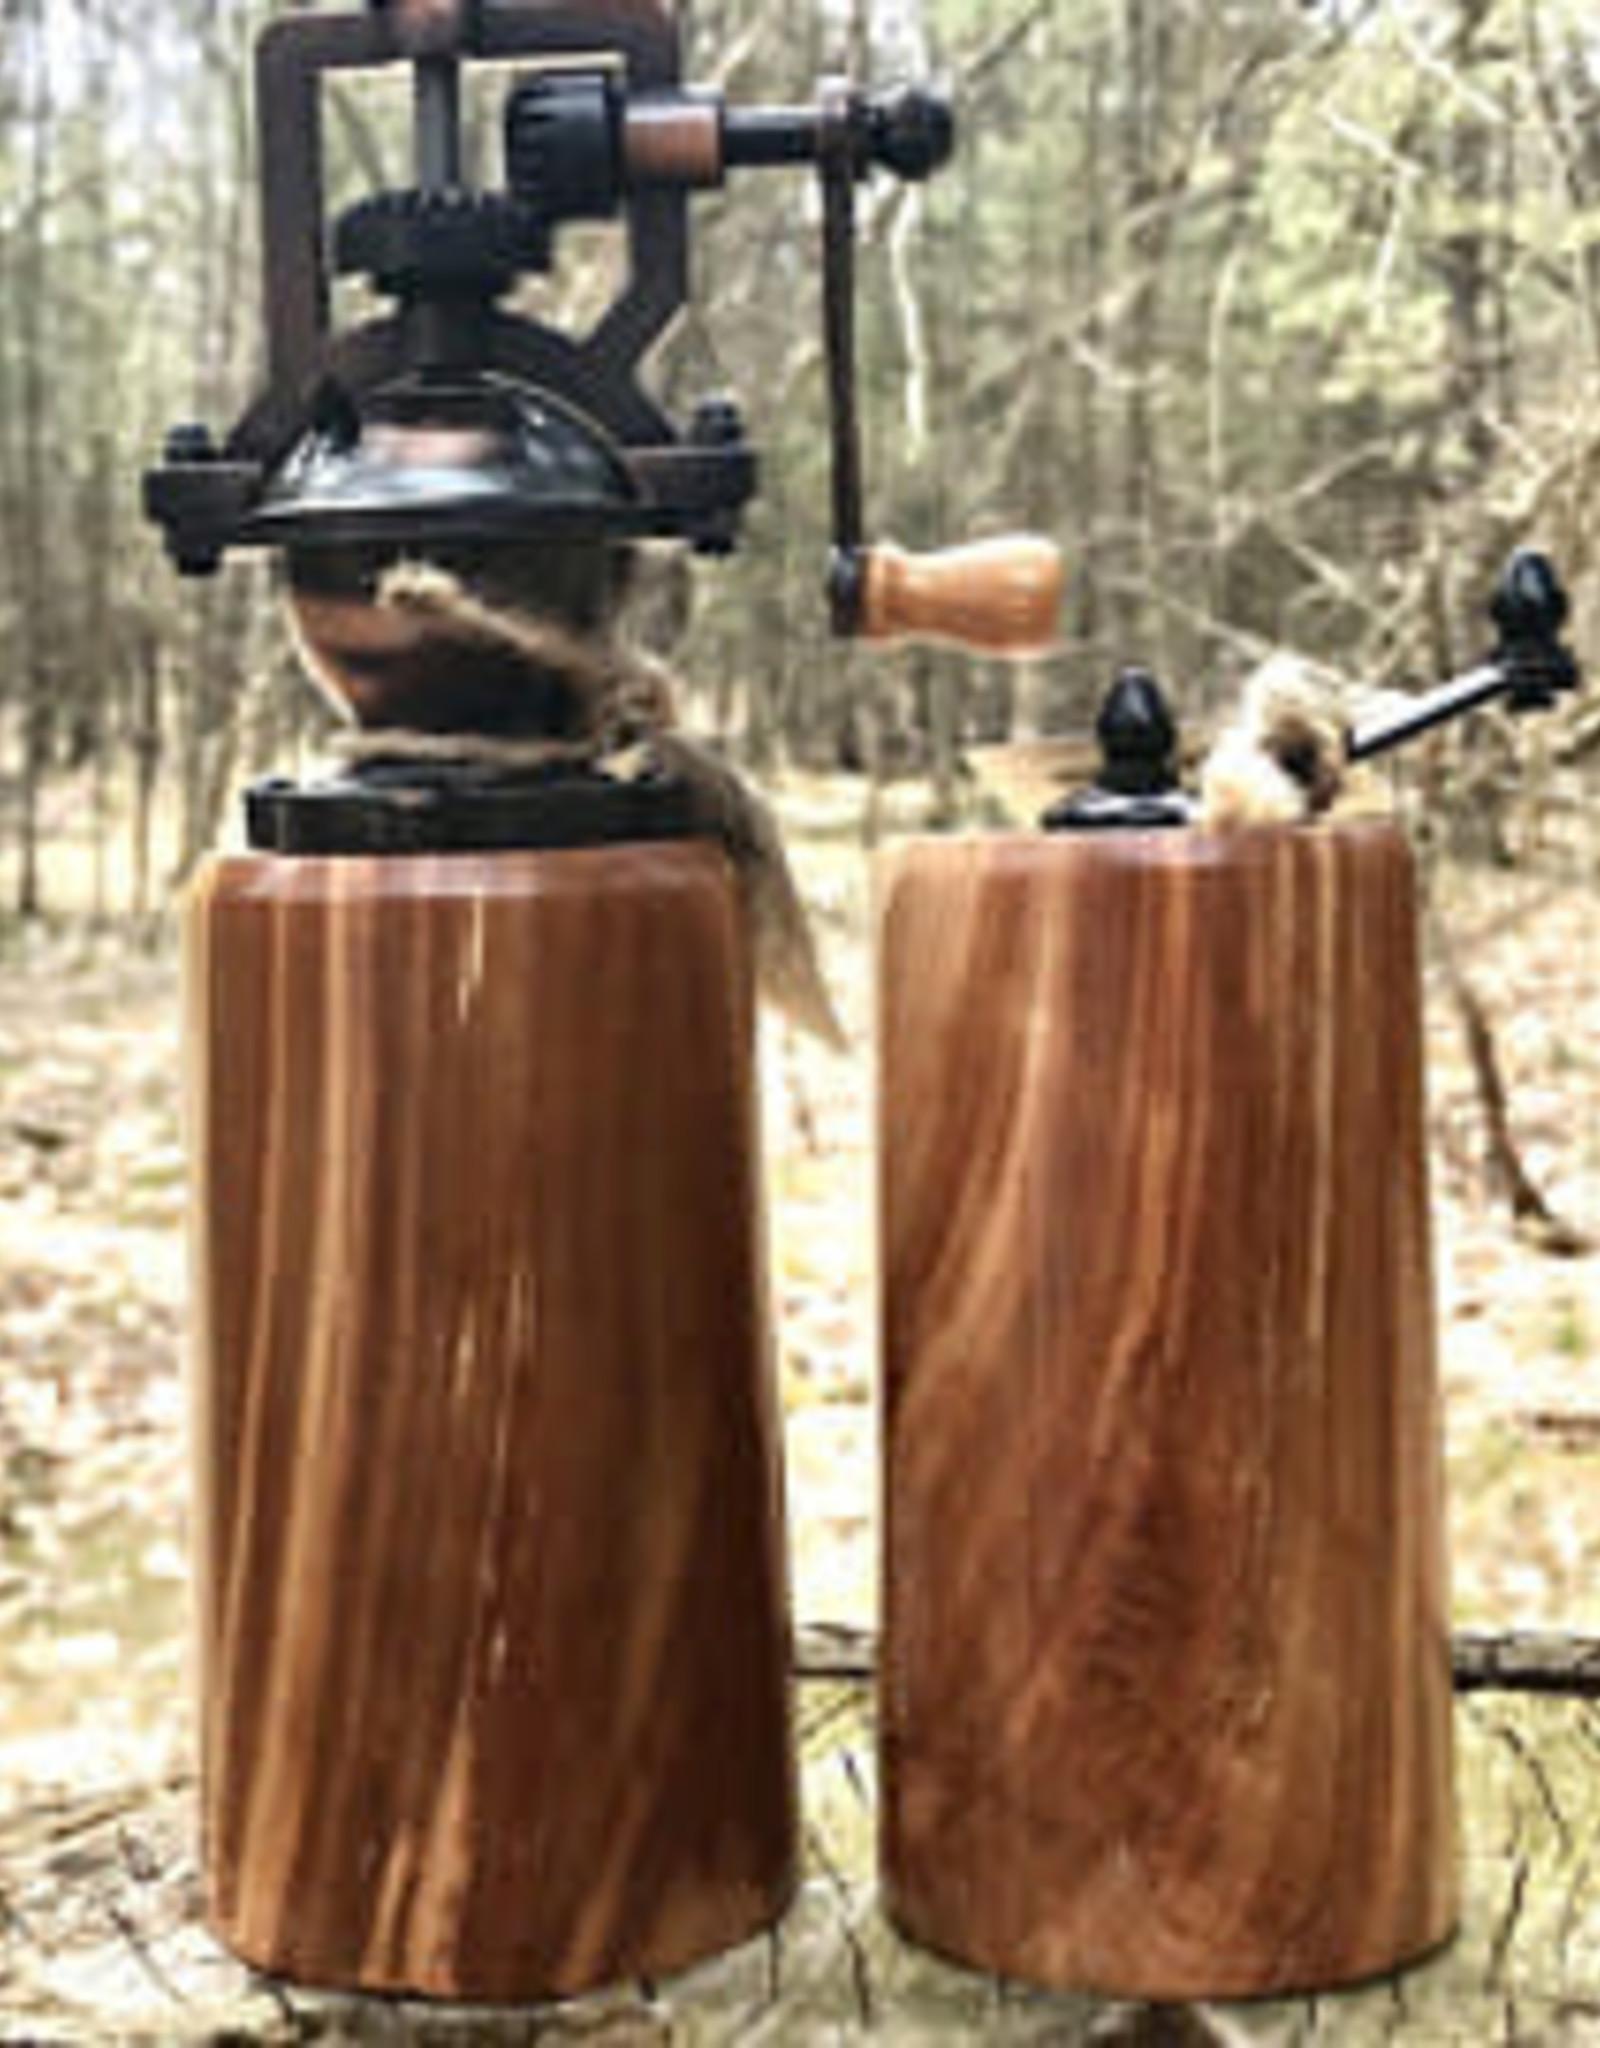 Rosewell Woodworking Cherry Burl Salt & Pepper Grinder